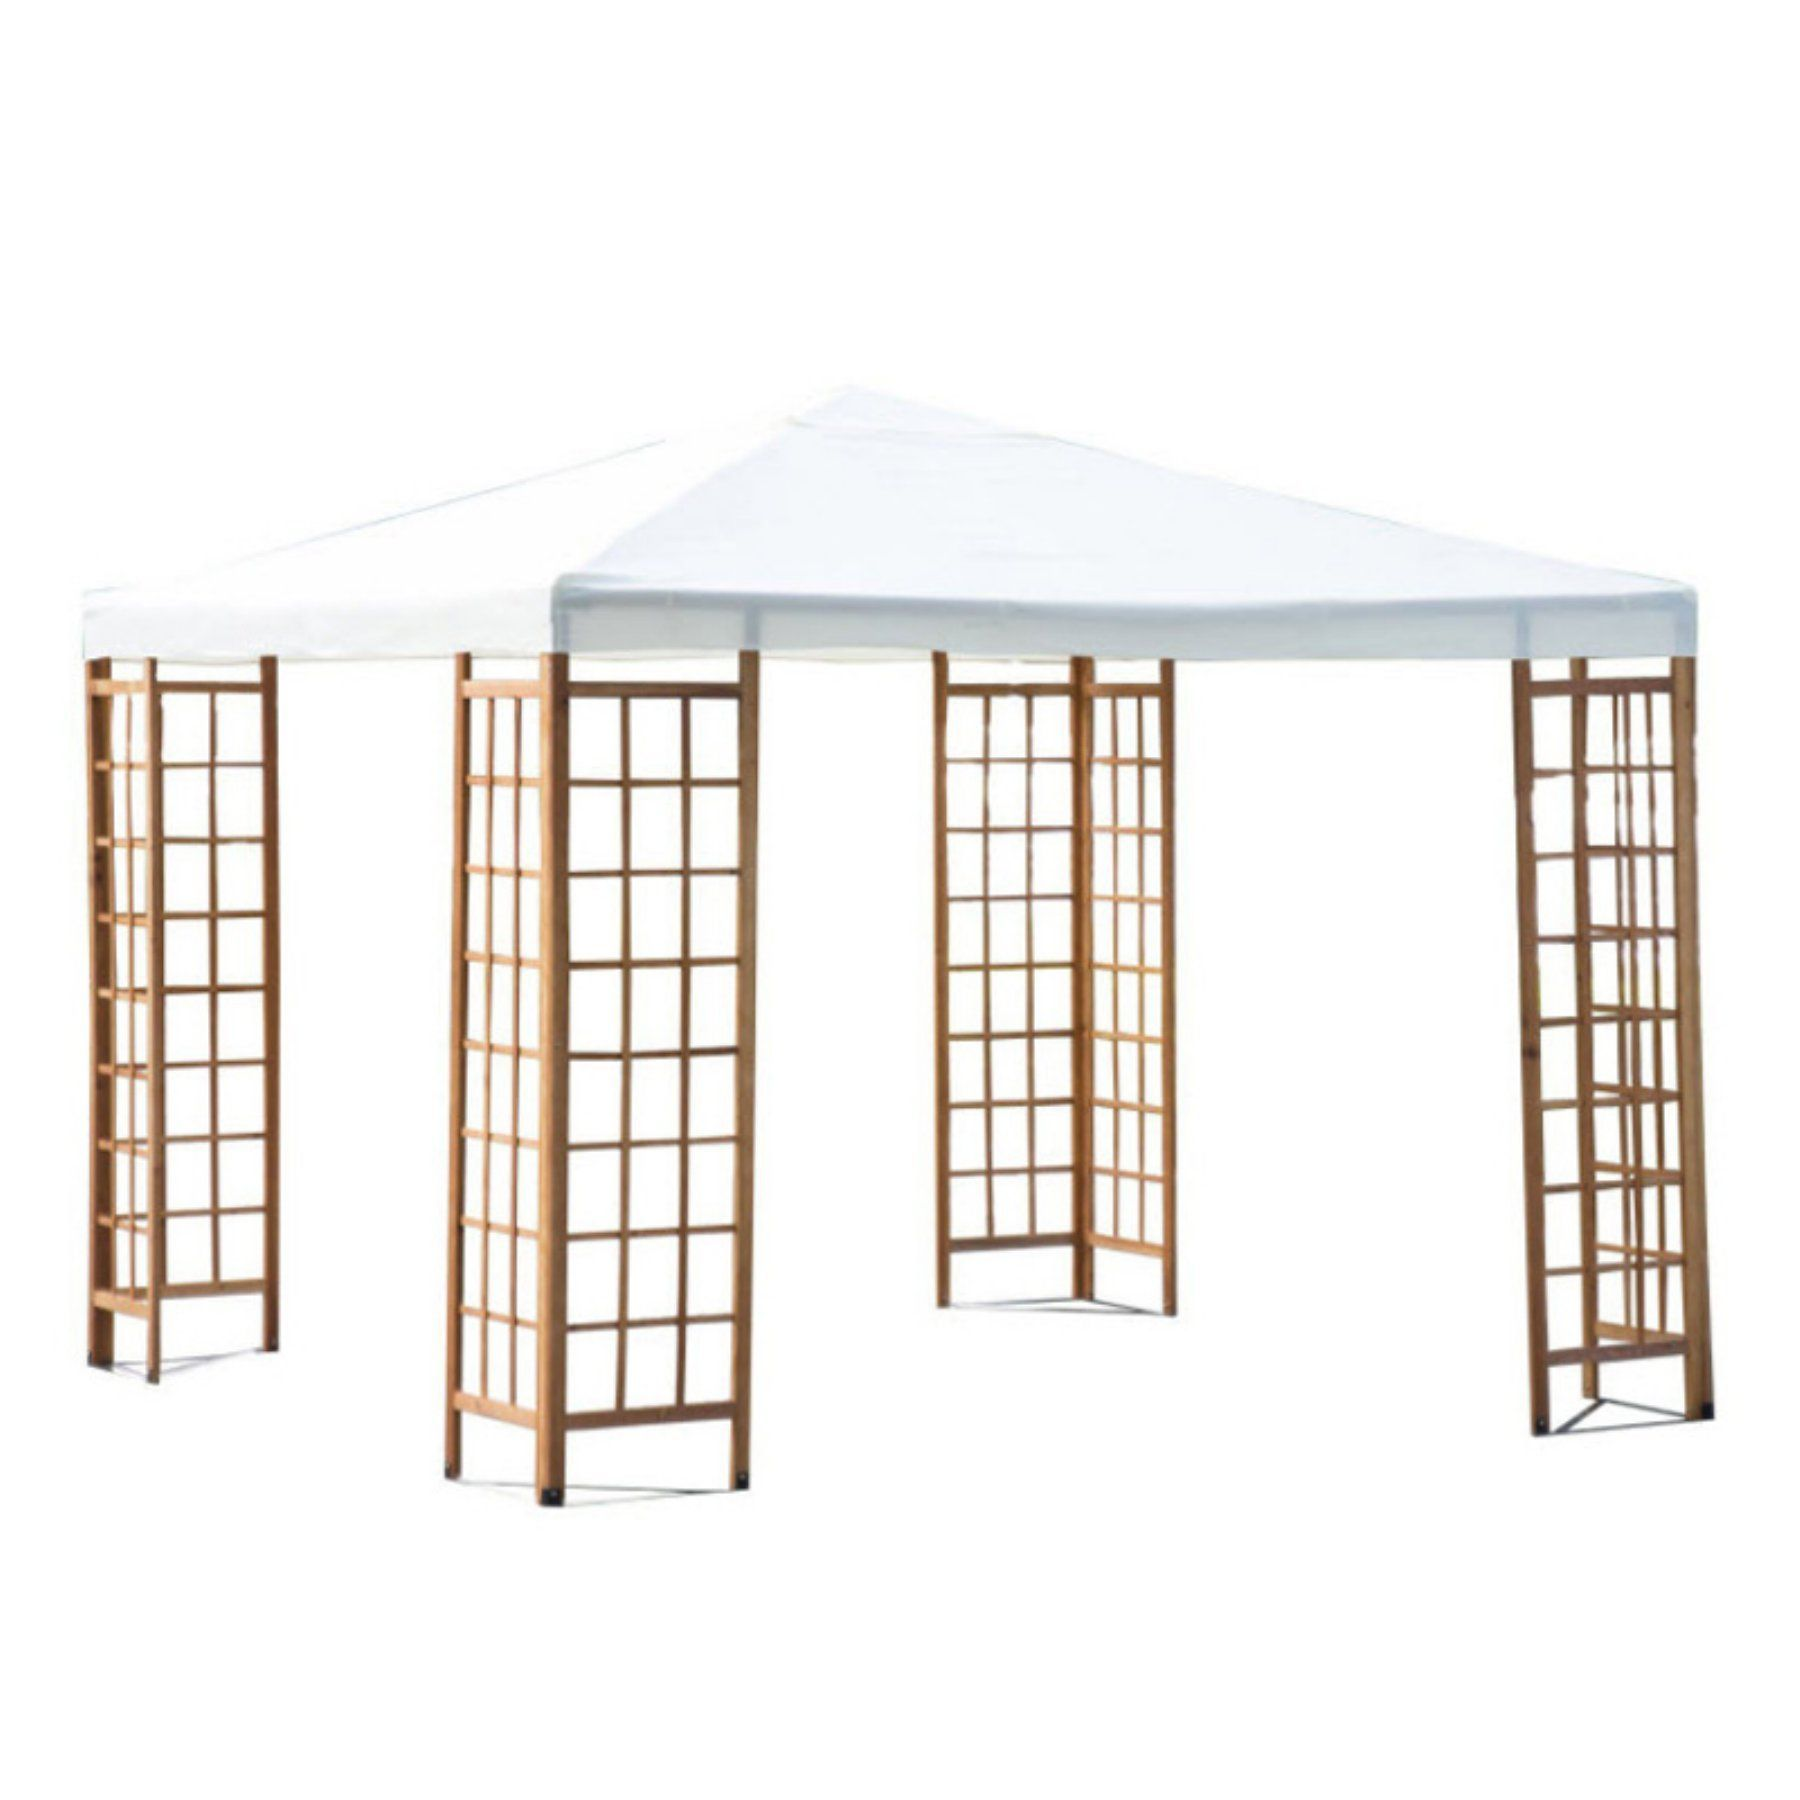 Outsunny 10 x 10 ft. Patio Canopy Pavilion Gazebo - 840-021CW